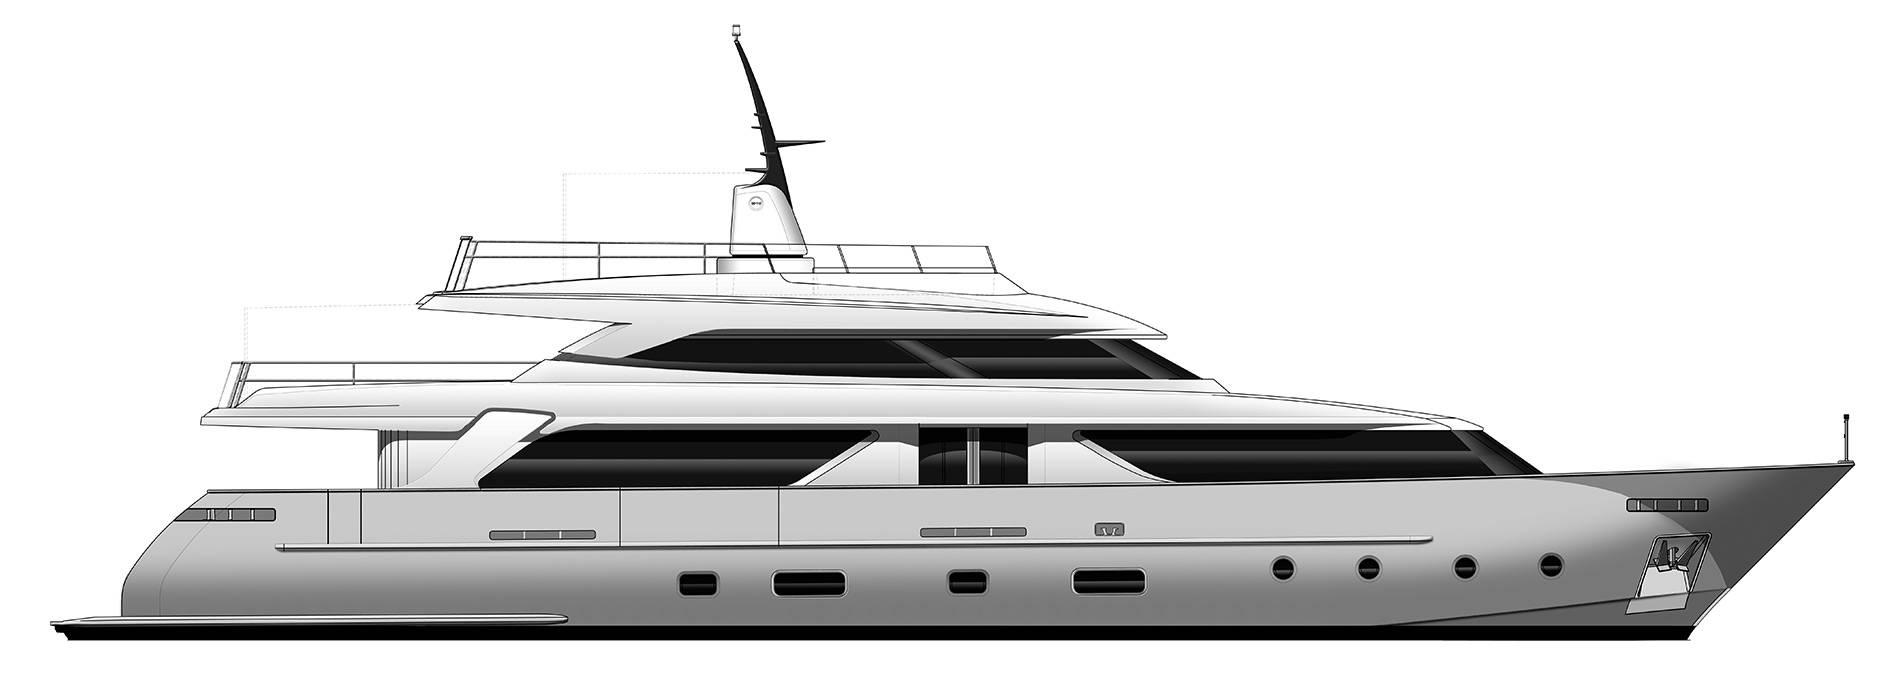 Sanlorenzo Yachts SD112 外观